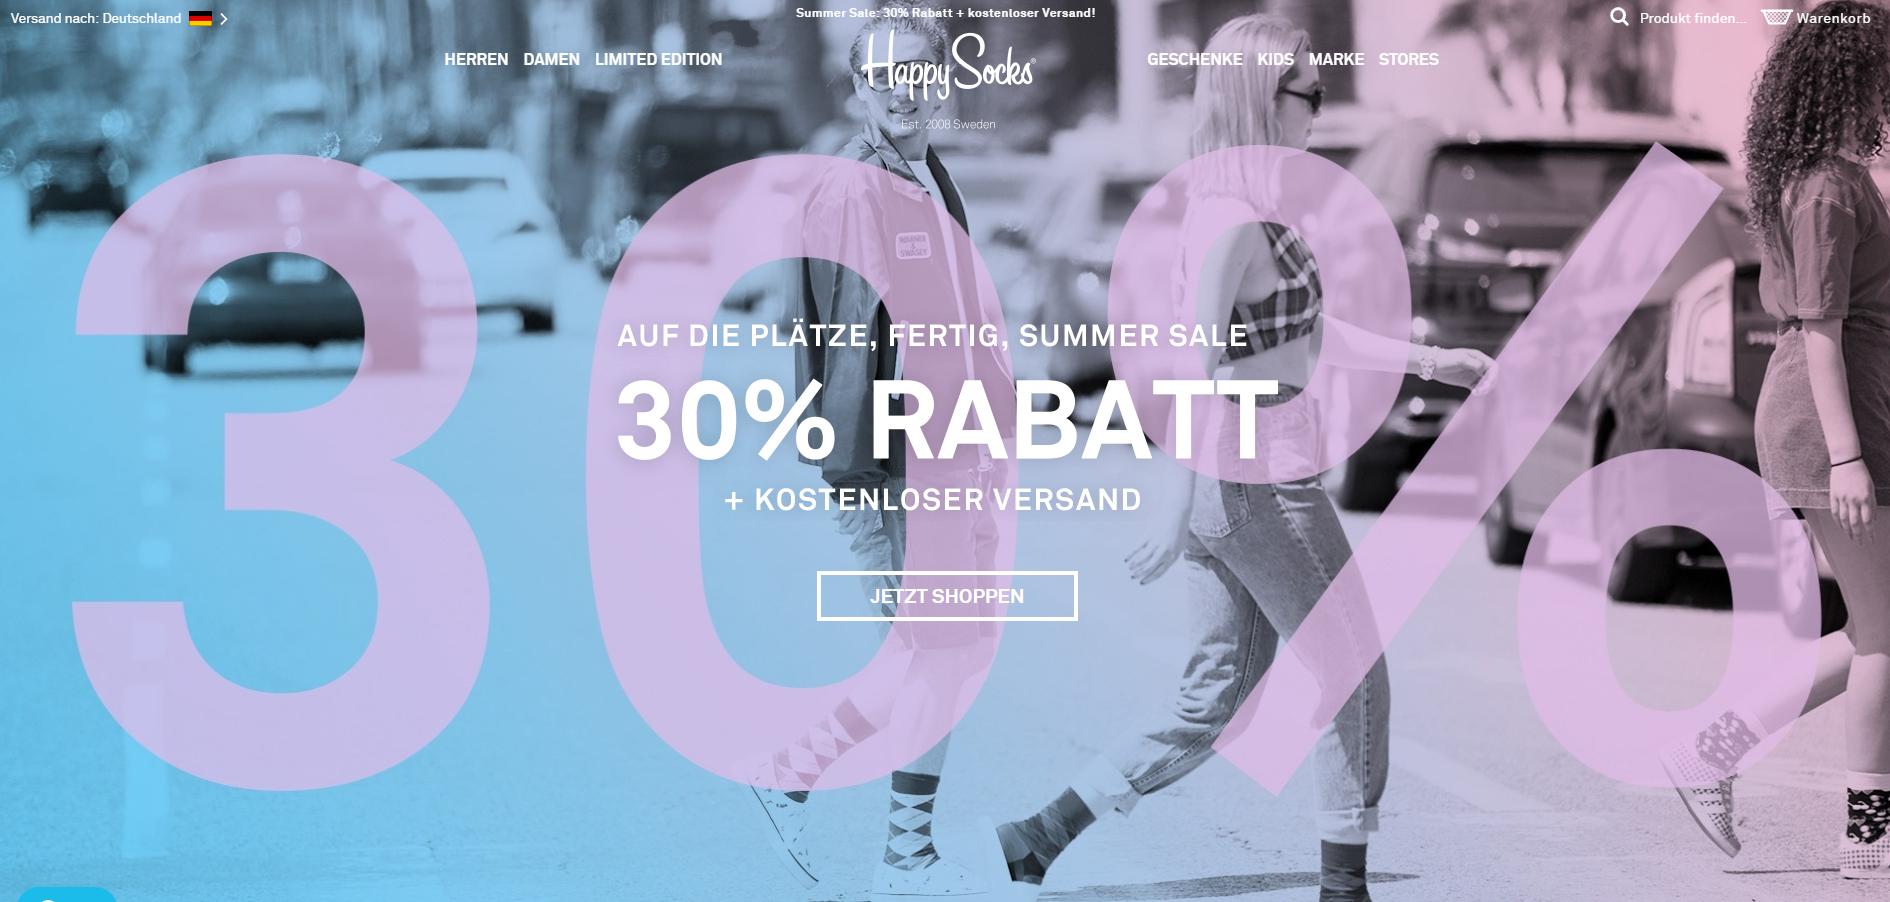 30% Rabatt + 10% Newsletter + kostenloser Versand bei Happy Socks